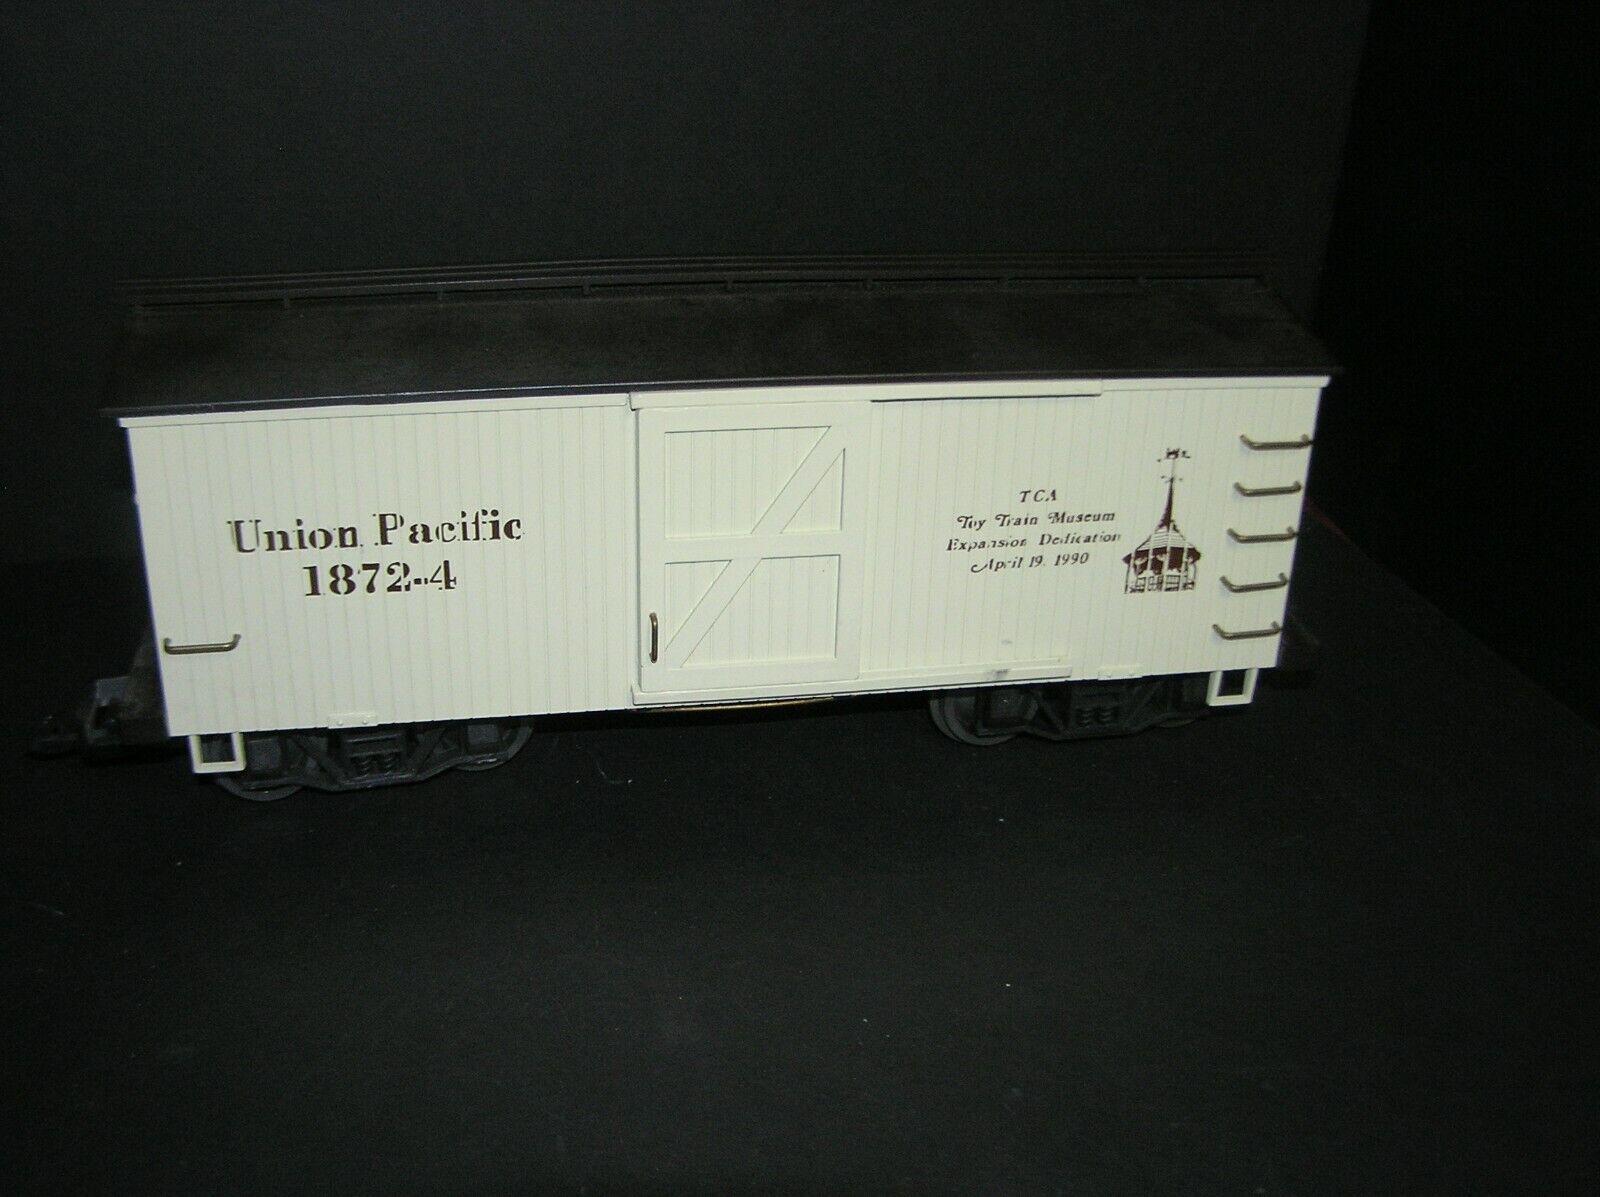 Kalamazoo G Gauge Union Pacific Box Car TCA Museum 1990 LGB Couplers (H)